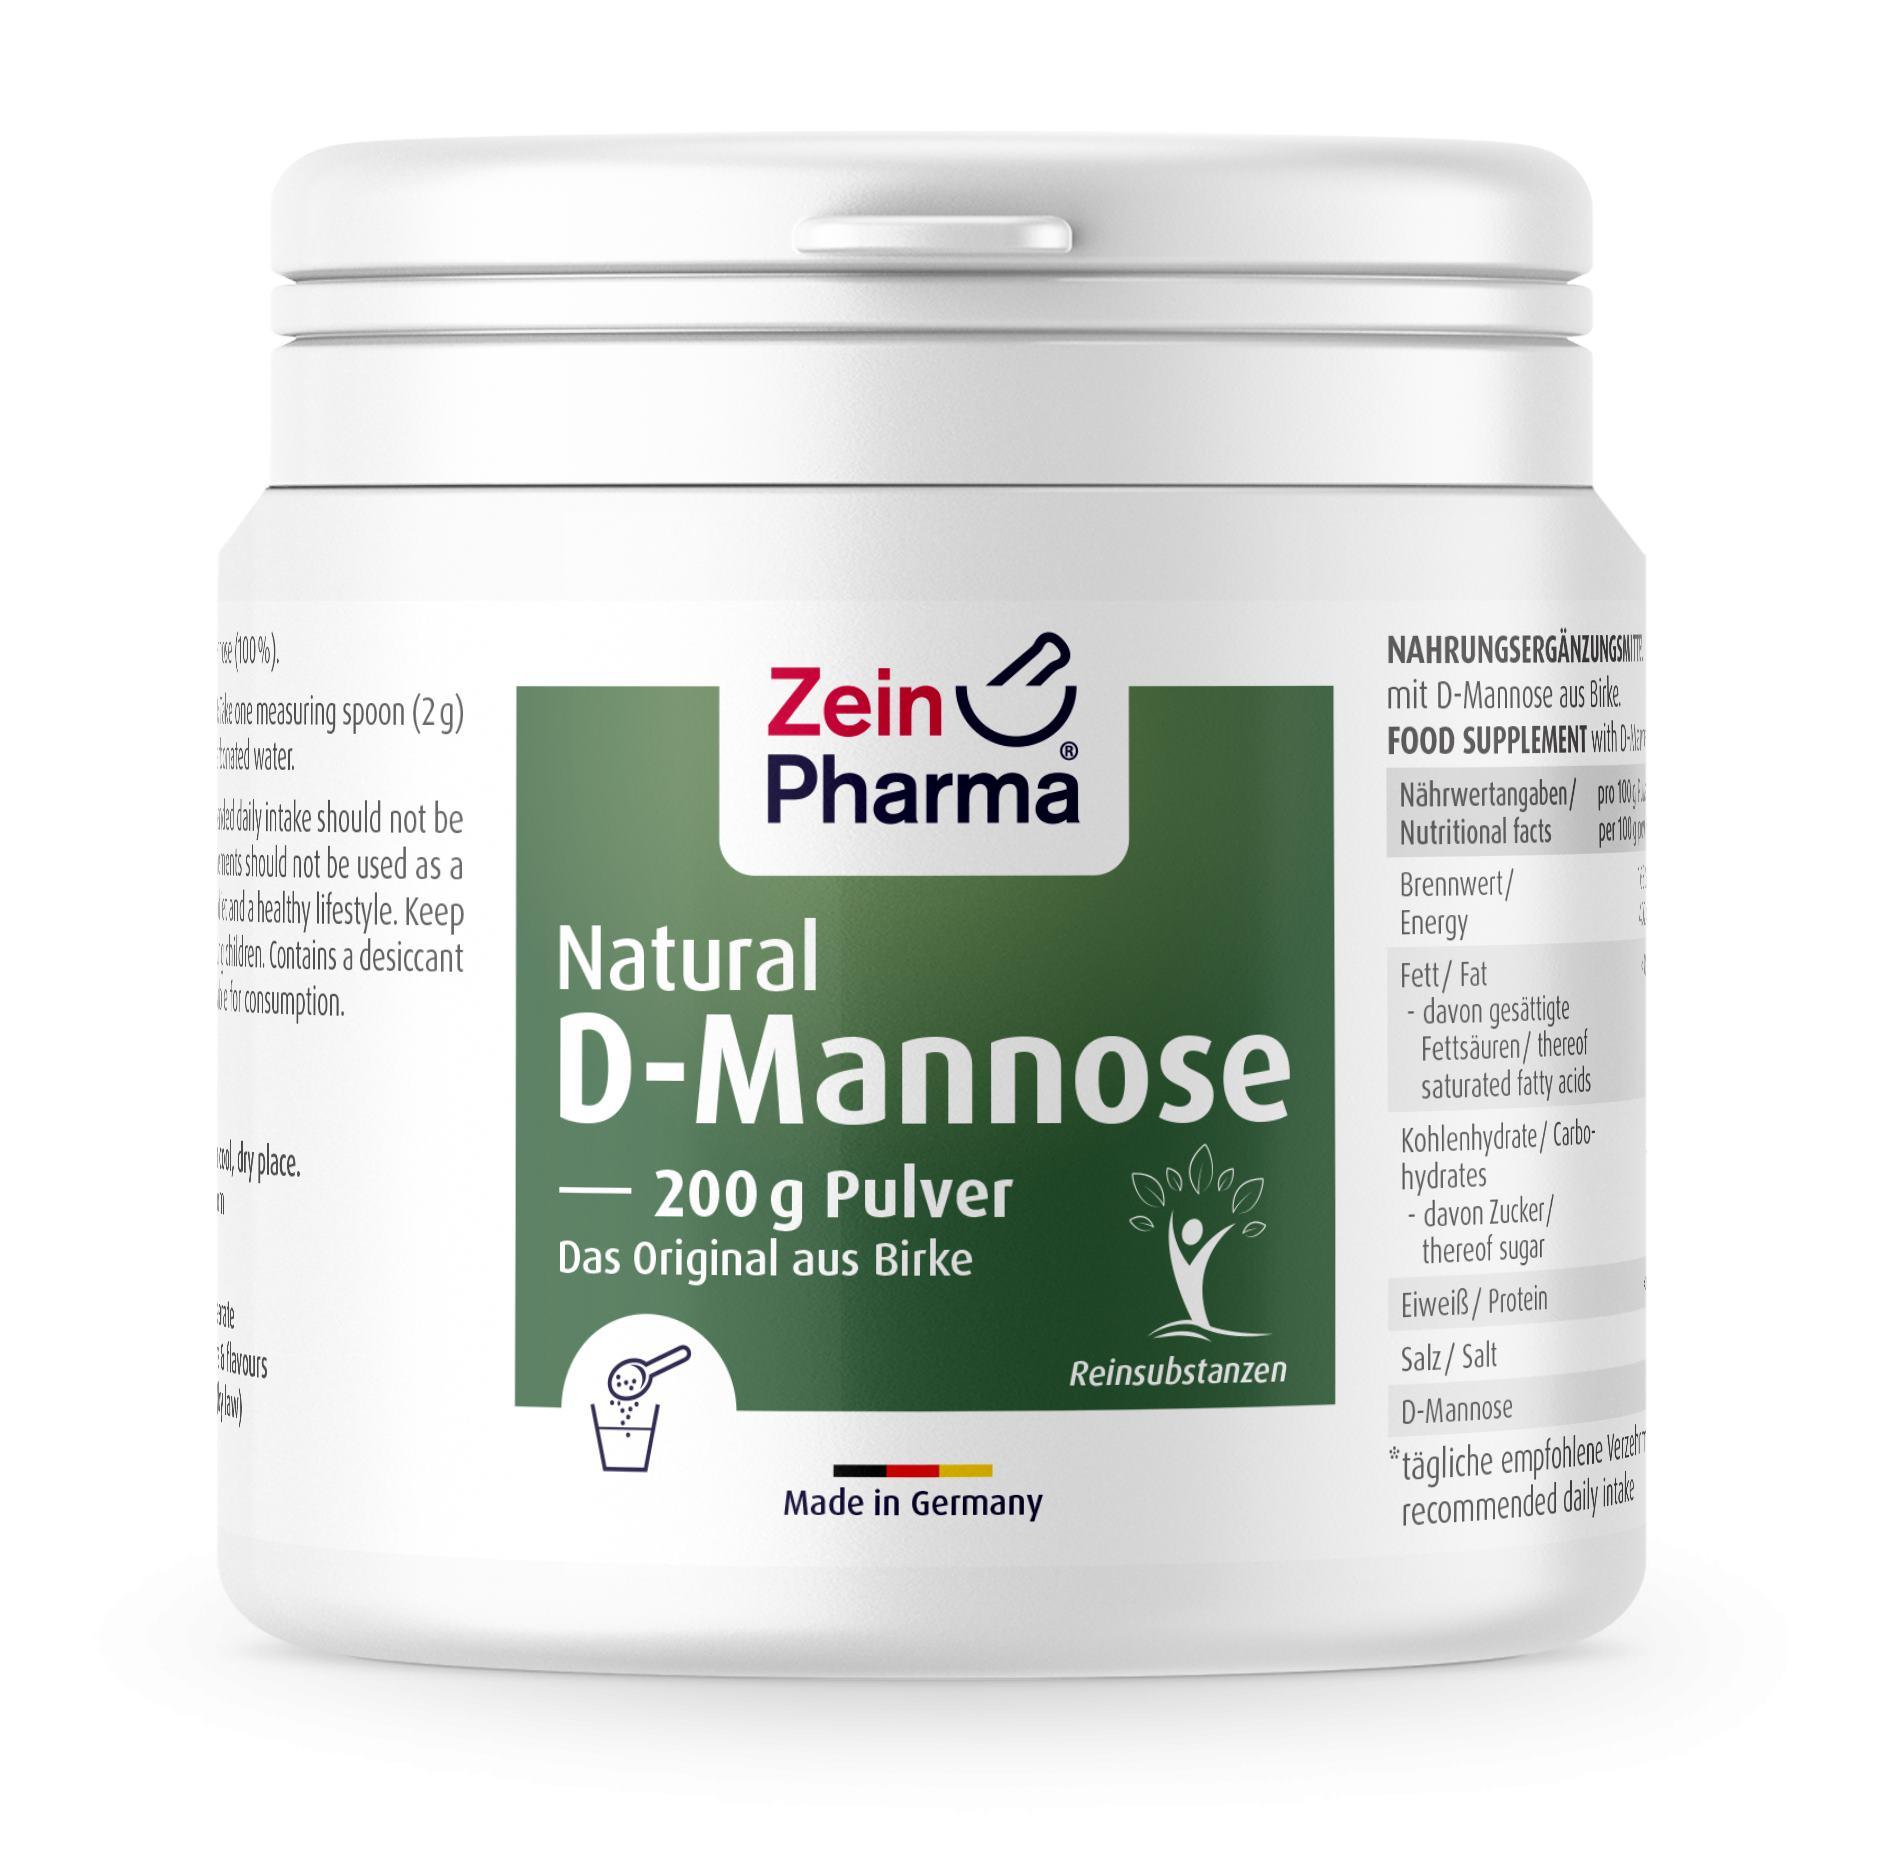 Natural D-Mannose Pulver 200g